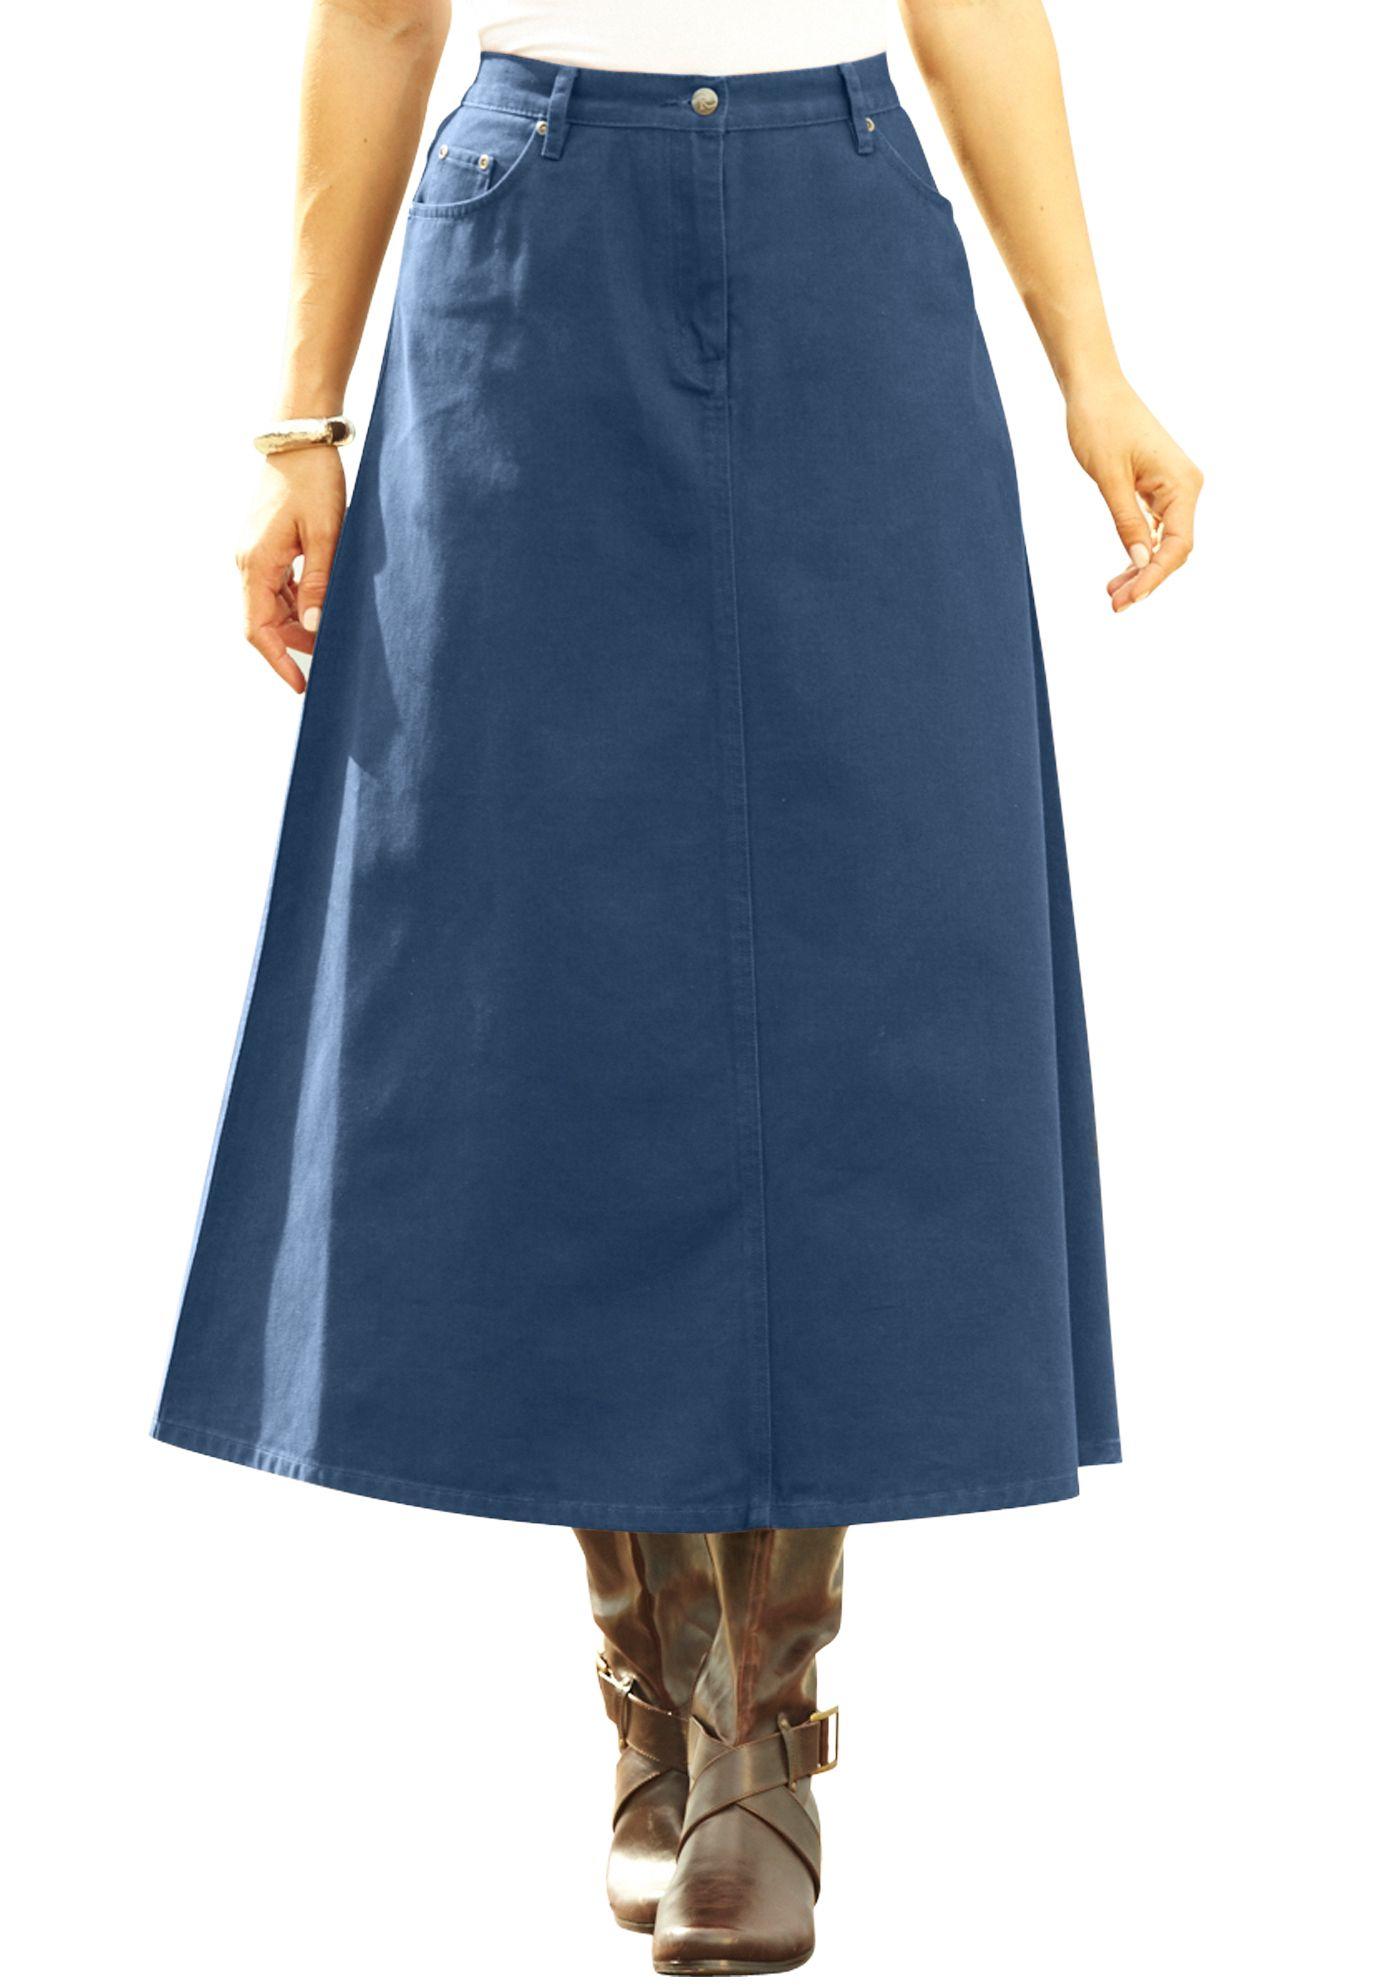 denim a line skirt my style